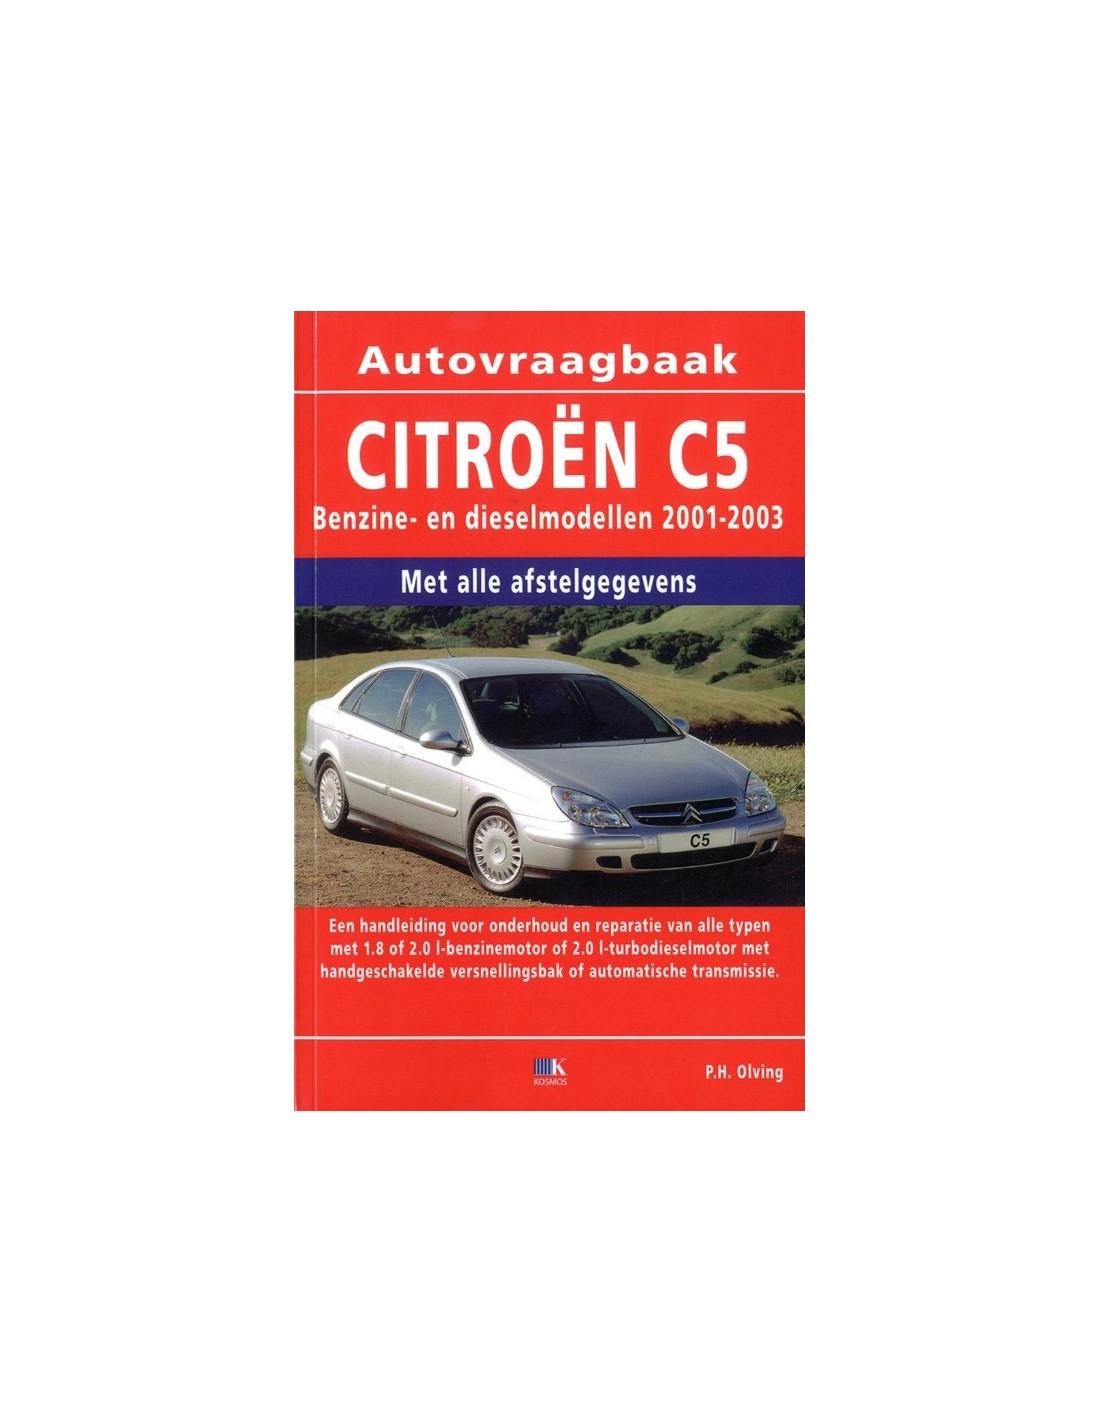 citroen c5 2003 manual daily instruction manual guides u2022 rh testingwordpress co New Citroen C5 Citroen C4